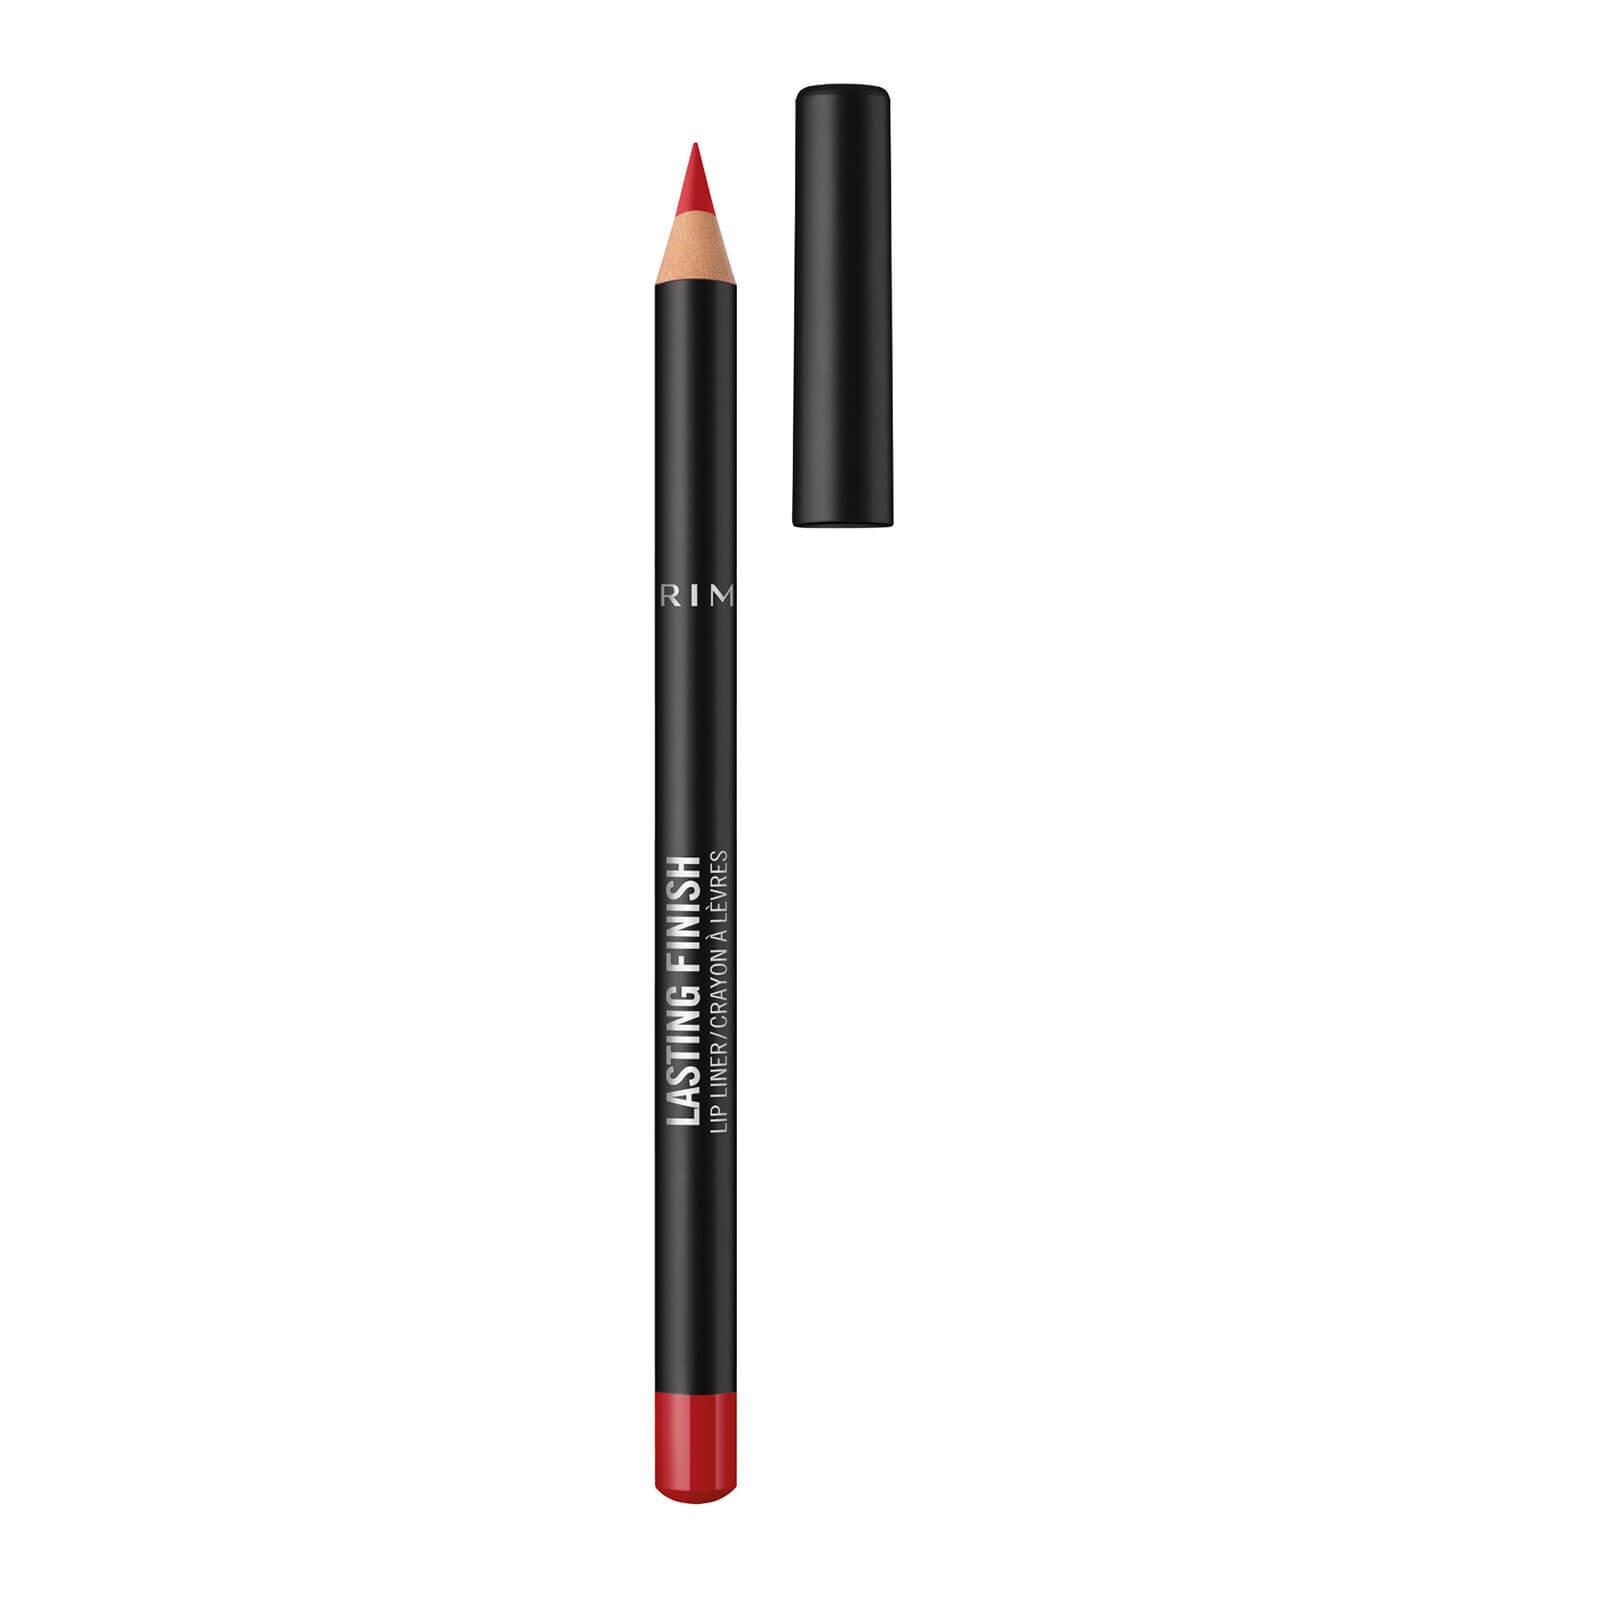 Купить Rimmel Lasting Finish 8HR Lip Liner (Various Shades) - Red Dynamite 505